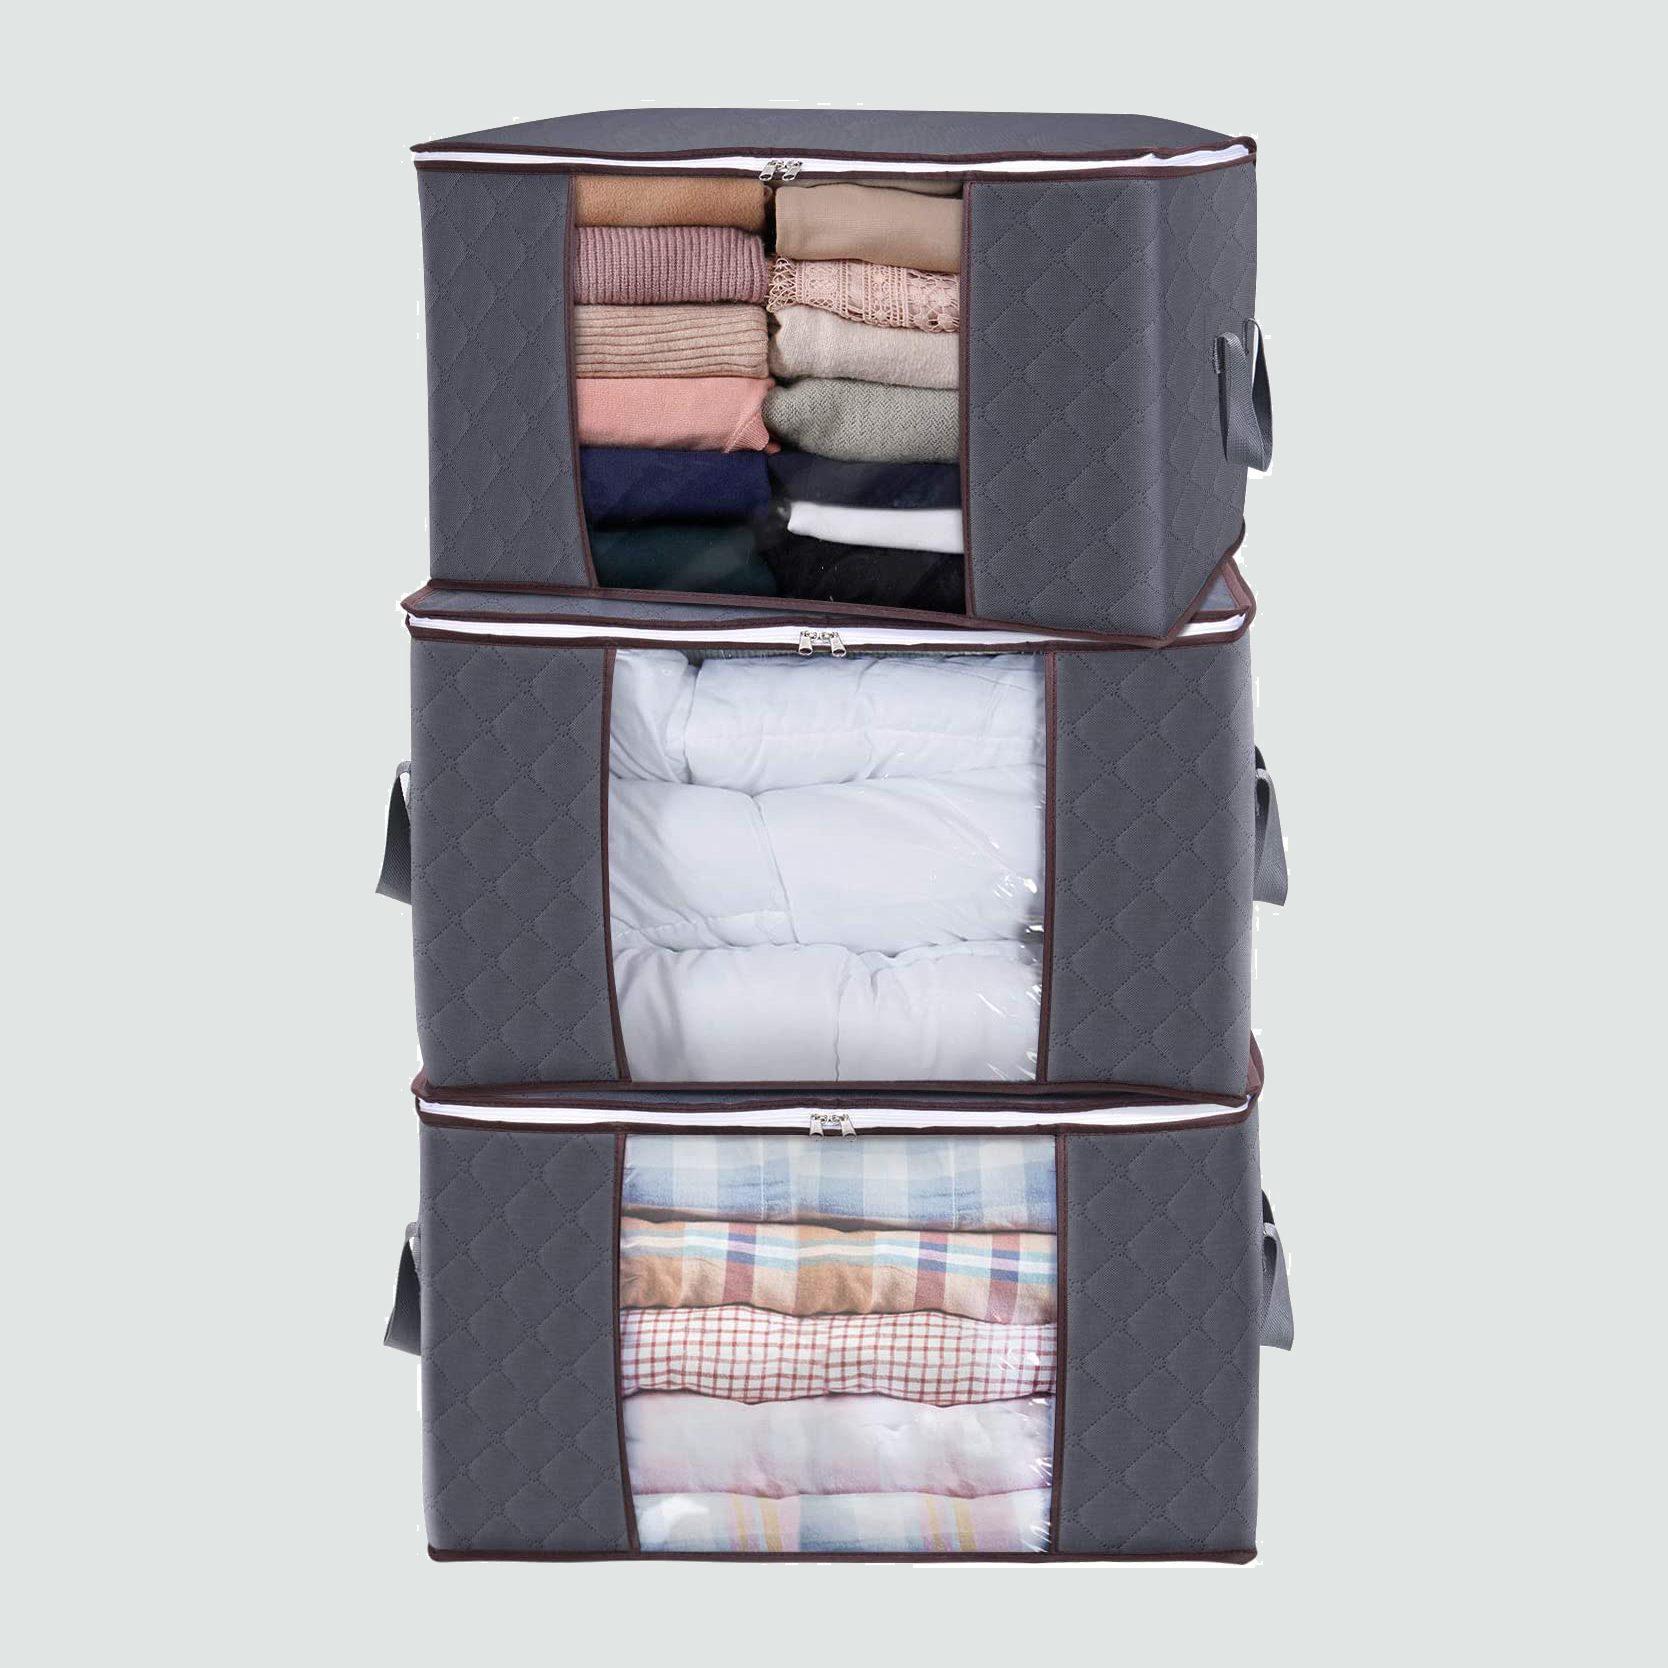 Lifewit linen closet storage bags